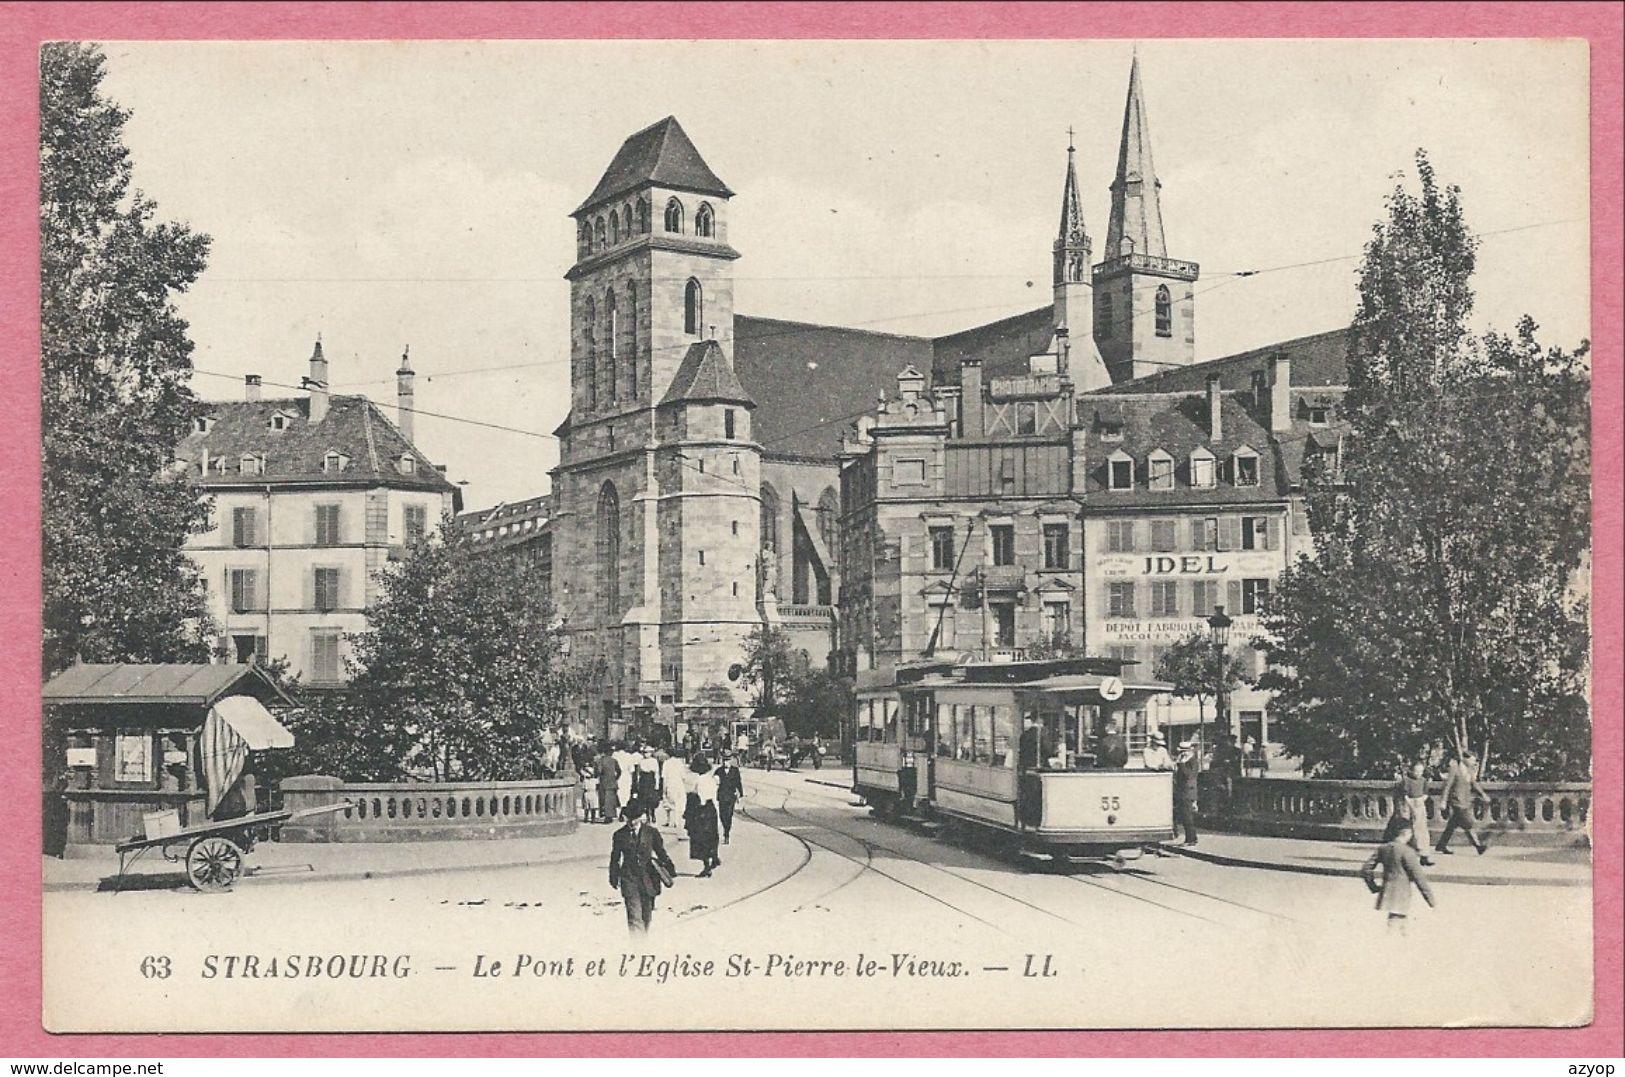 67 - STRASBOURG - Le Pont Et L' Eglise St Pierre Le VIeux - Tram - Tramway - Strassenbahn - L.L. N° 63 - Strasbourg